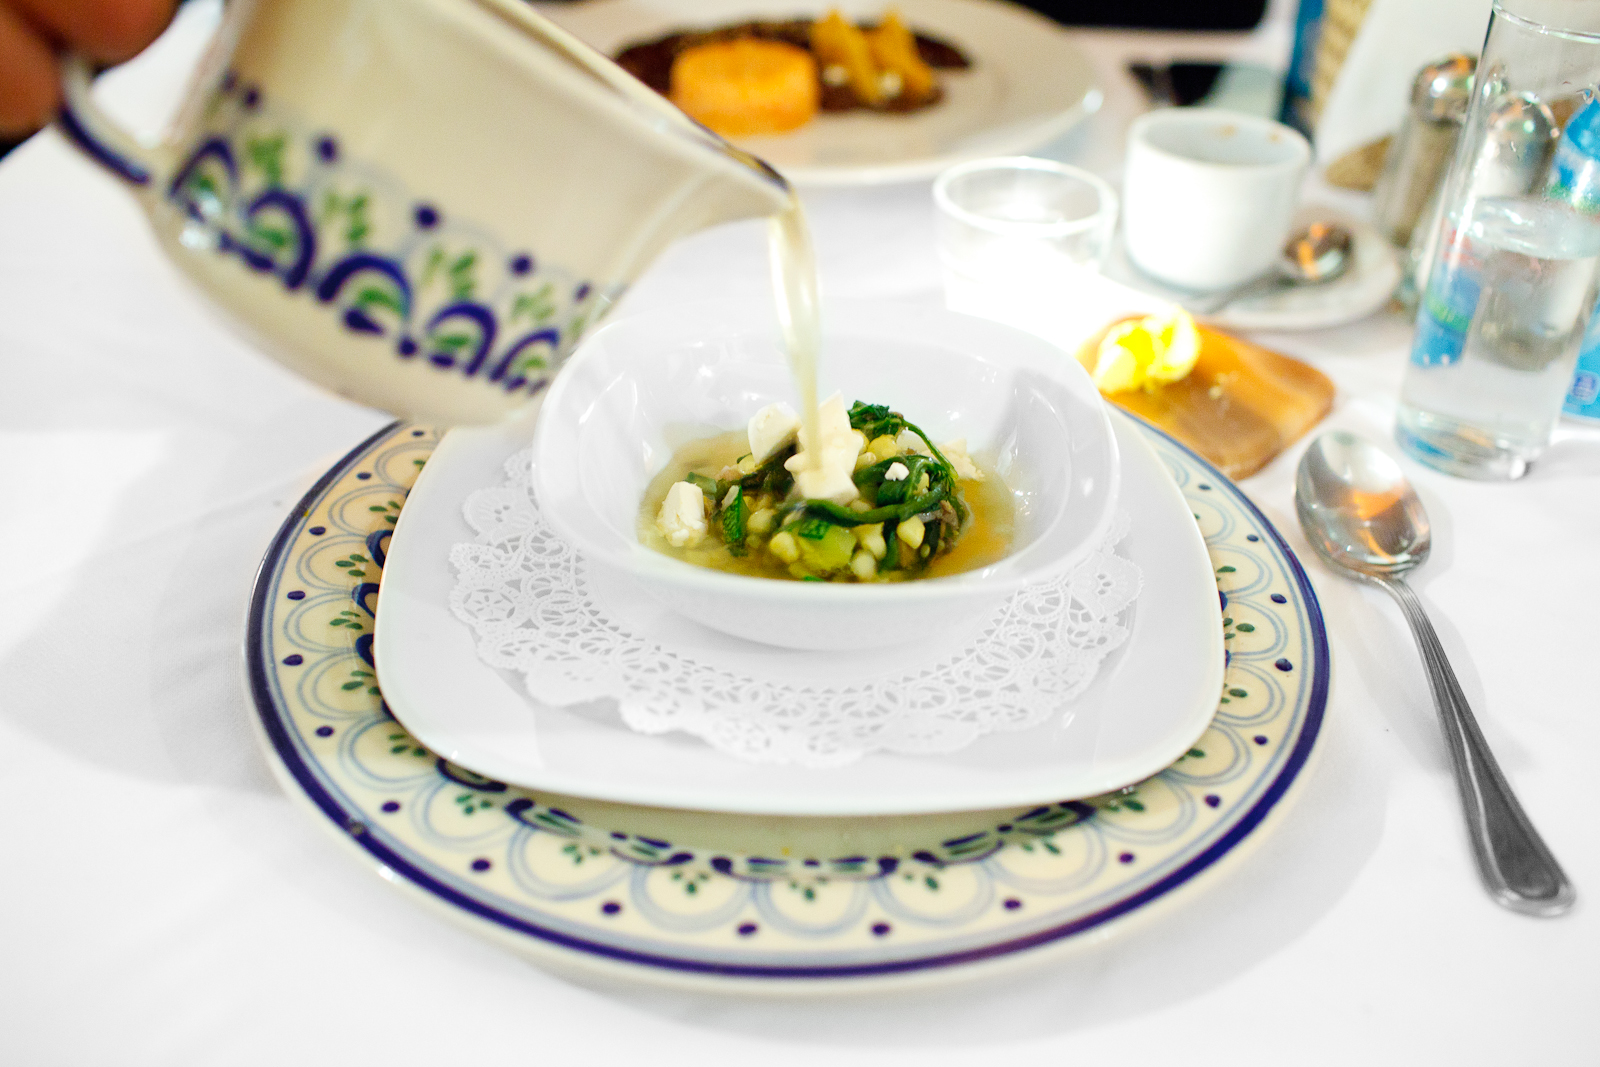 Sopa poblana - Tradicional consomé con rajas poblanas, queso fresco, granos de elote, champiñón, y flor de calabaza con epazote (Pueblan soup of poblano peppers, local cheese